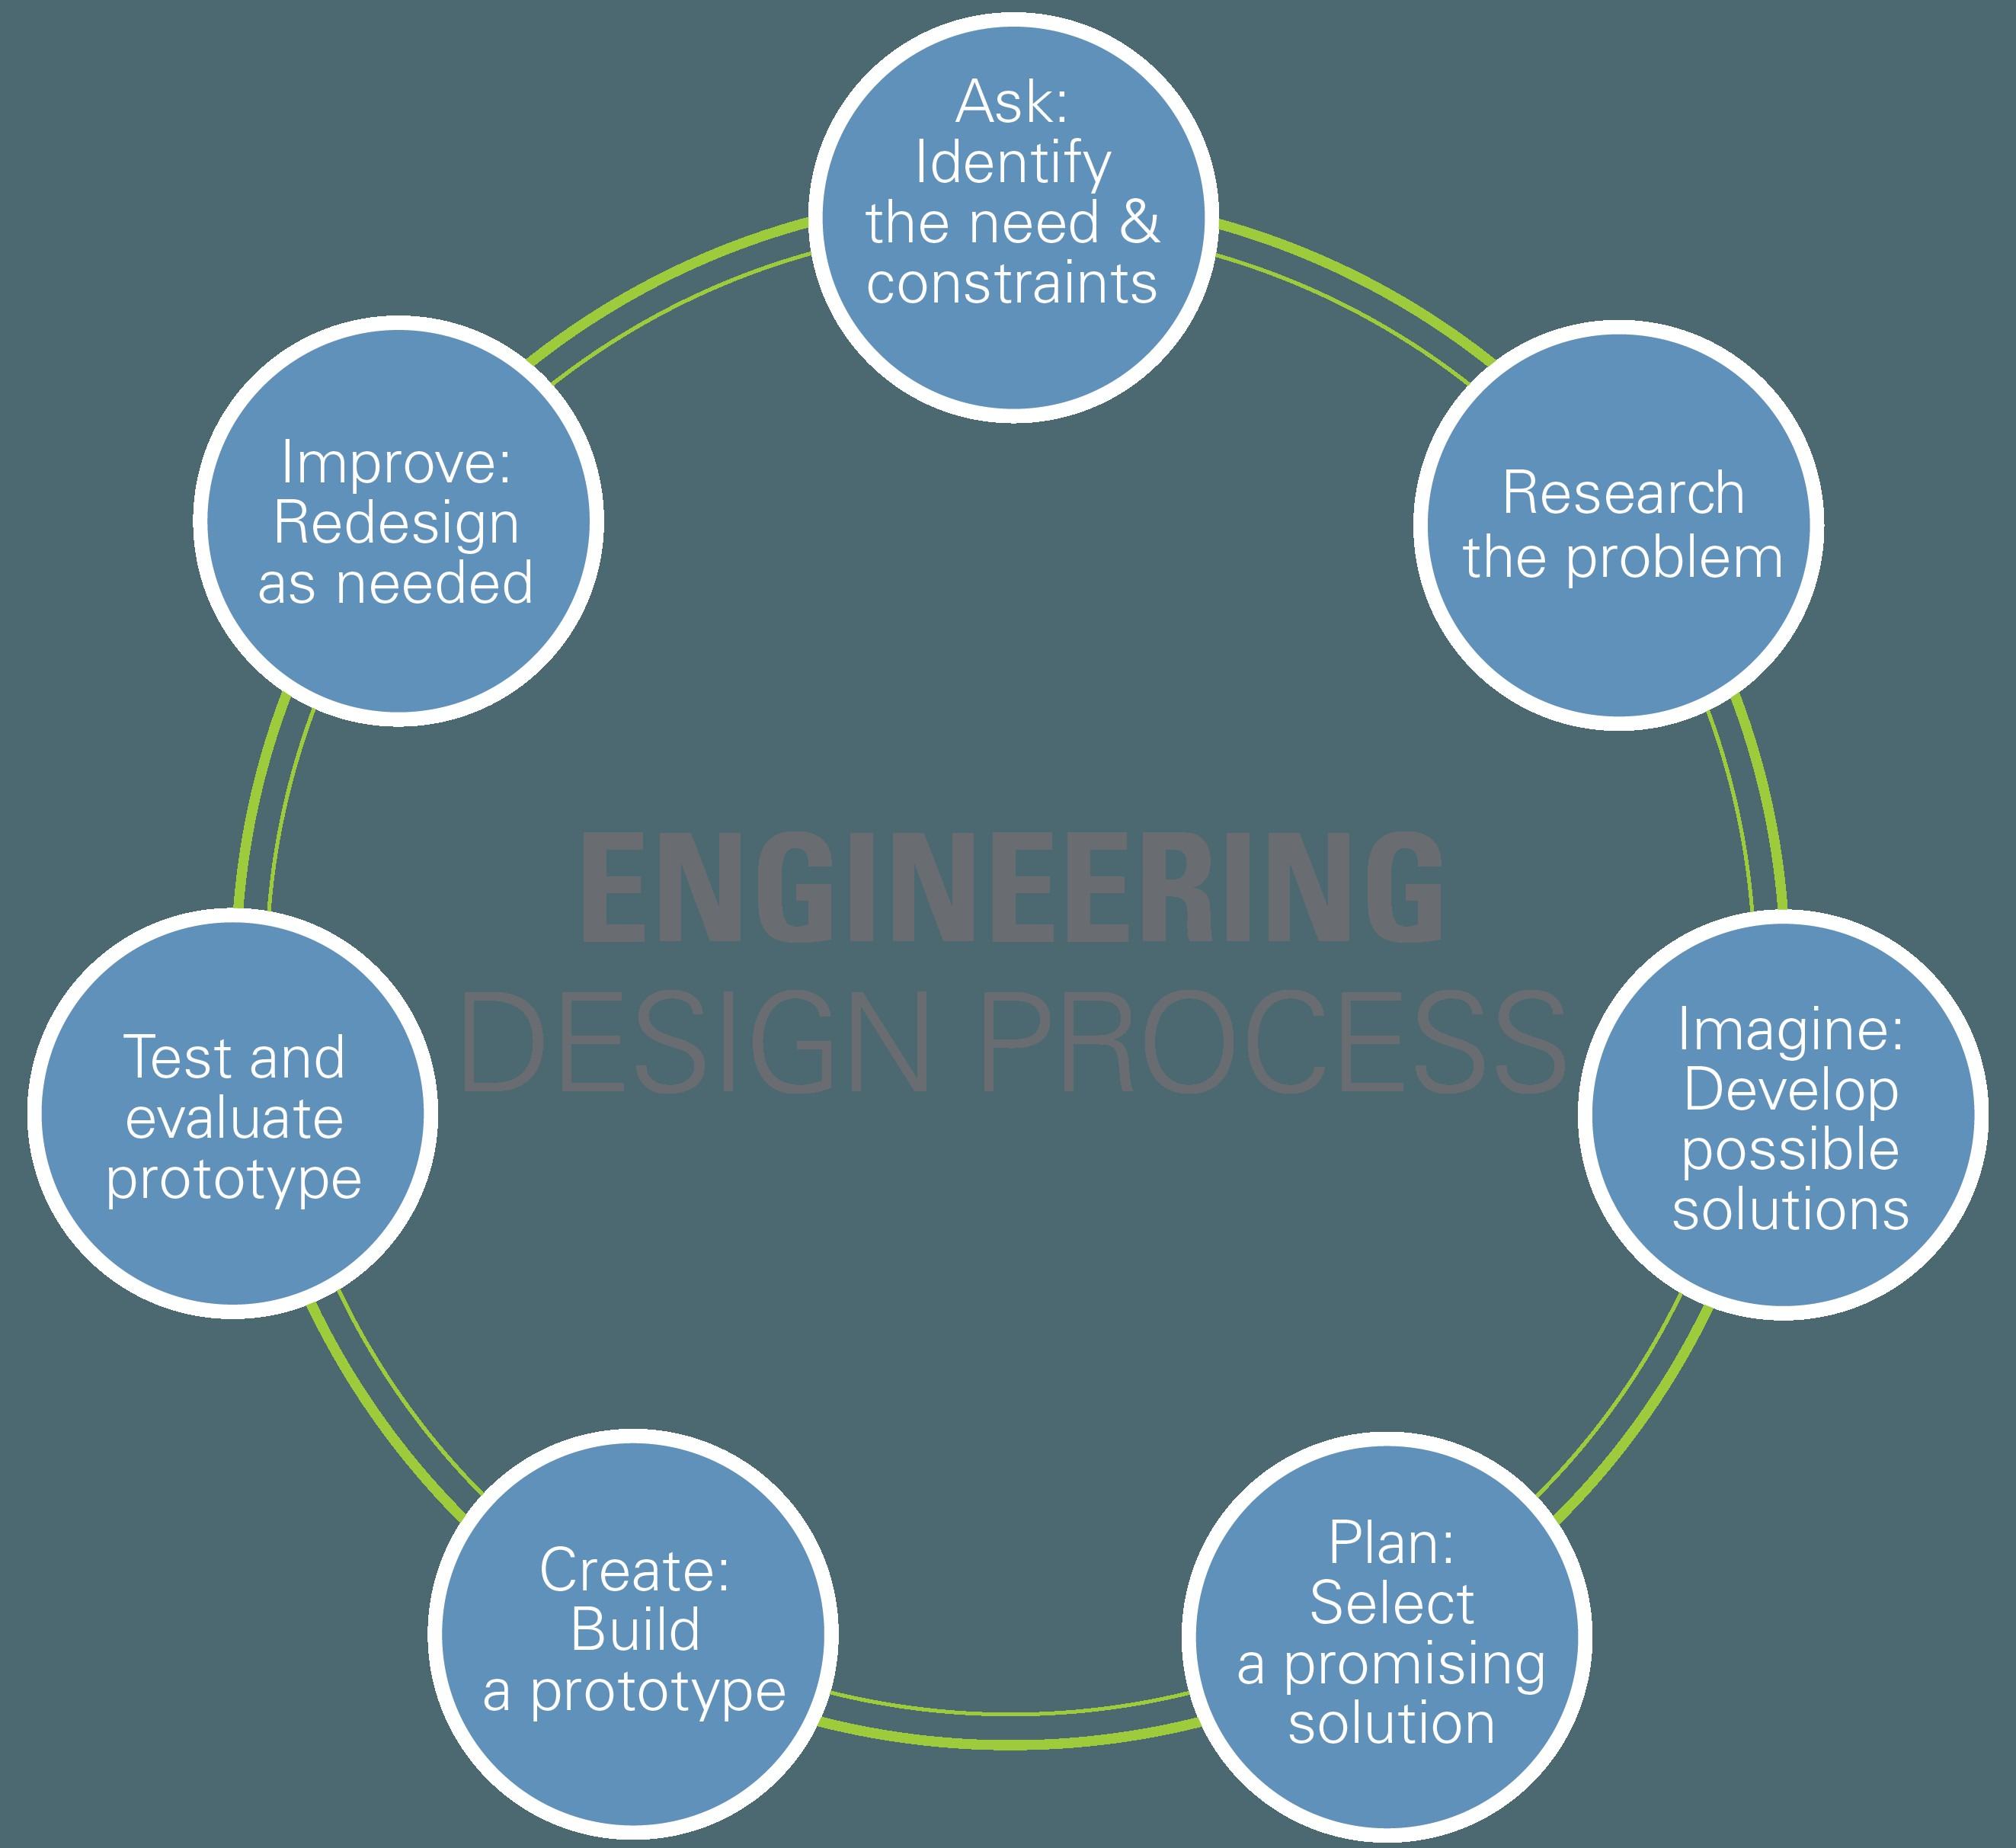 Engineering Design Process Diagram Engineering Design Process Puter Science Of Engineering Design Process Diagram